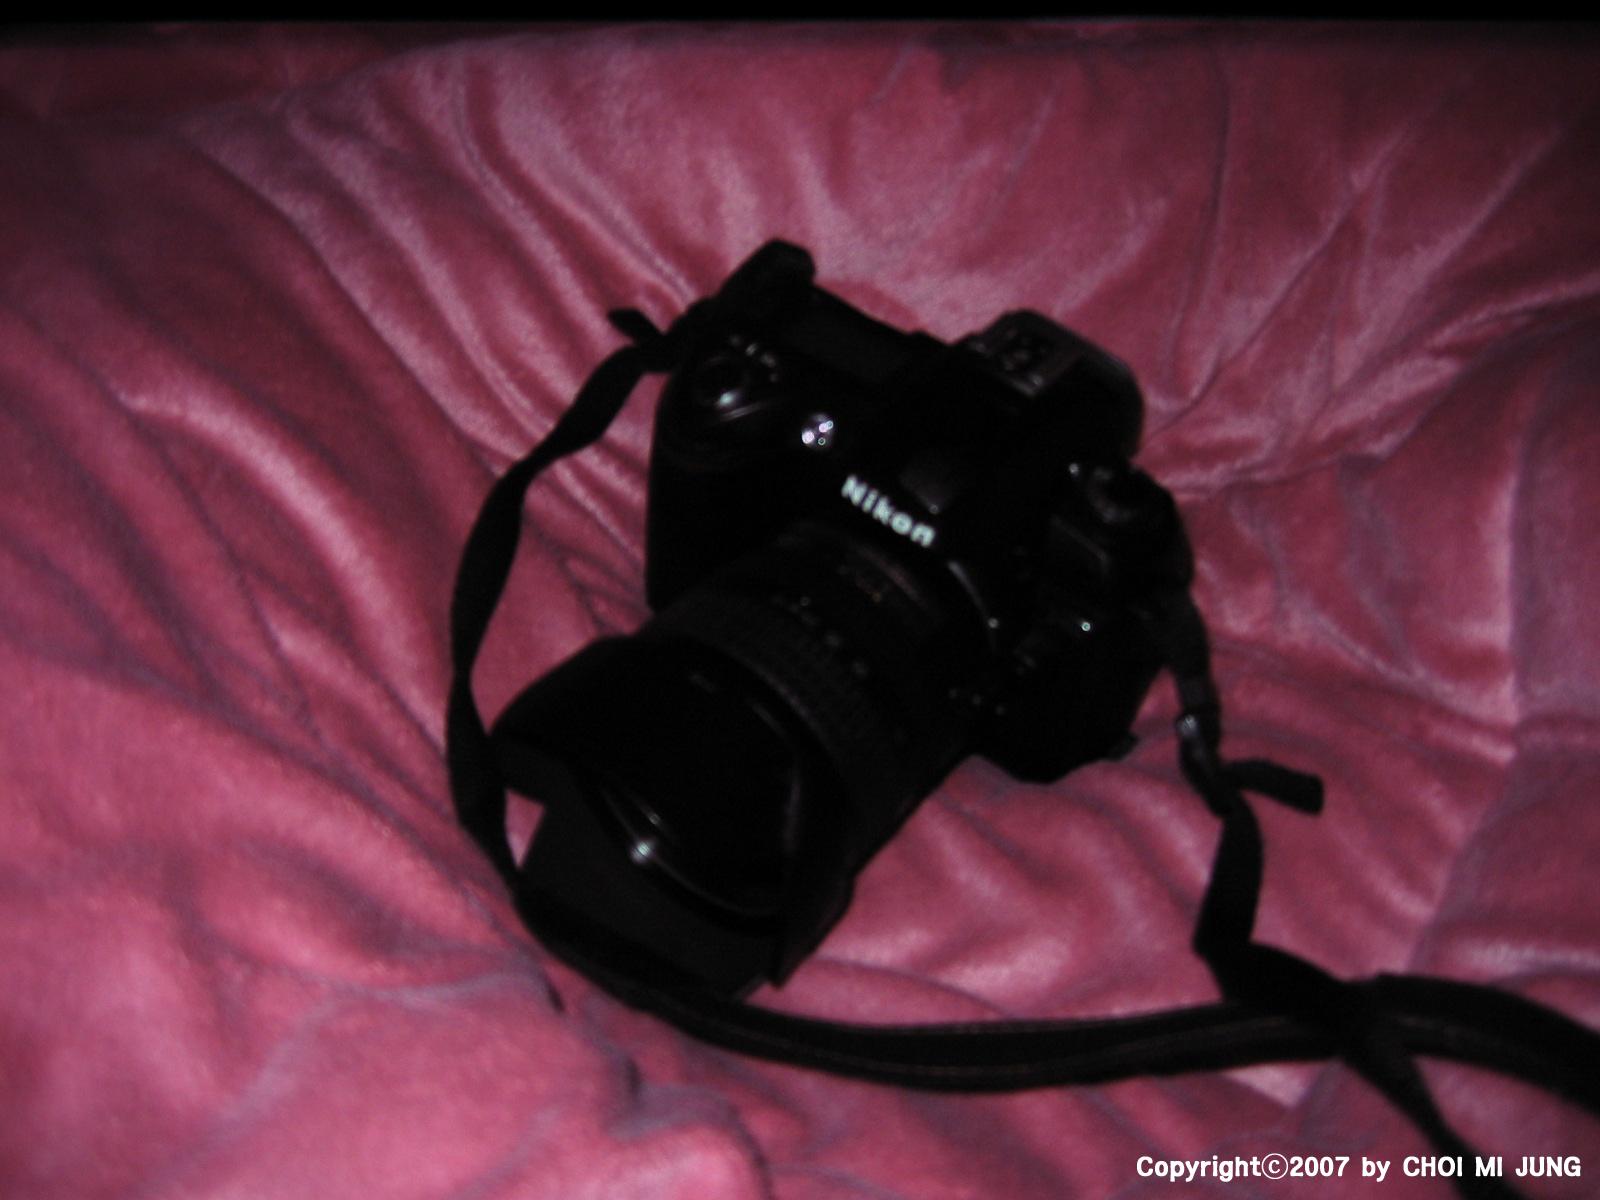 A80, Canon, D70S, Nikon, 디지털카메라, 디카, 캐논 A80, 첫번째 디카, 첫 카메라, 첫번째 디지털 카메라